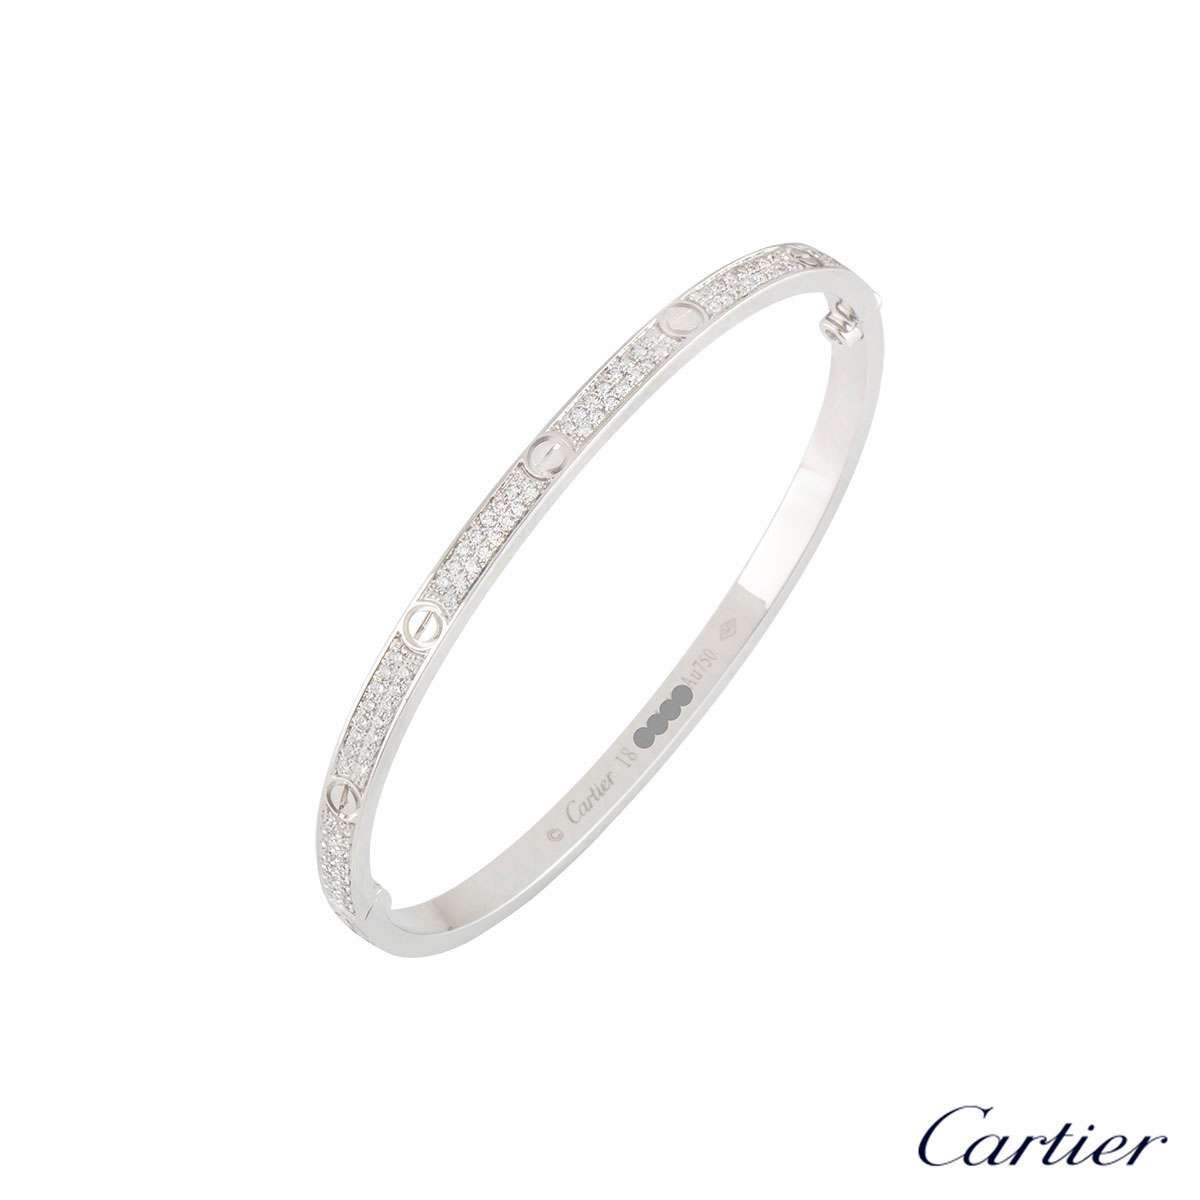 Cartier White Gold Pave Diamond Love Bracelet Size 18 N6710818